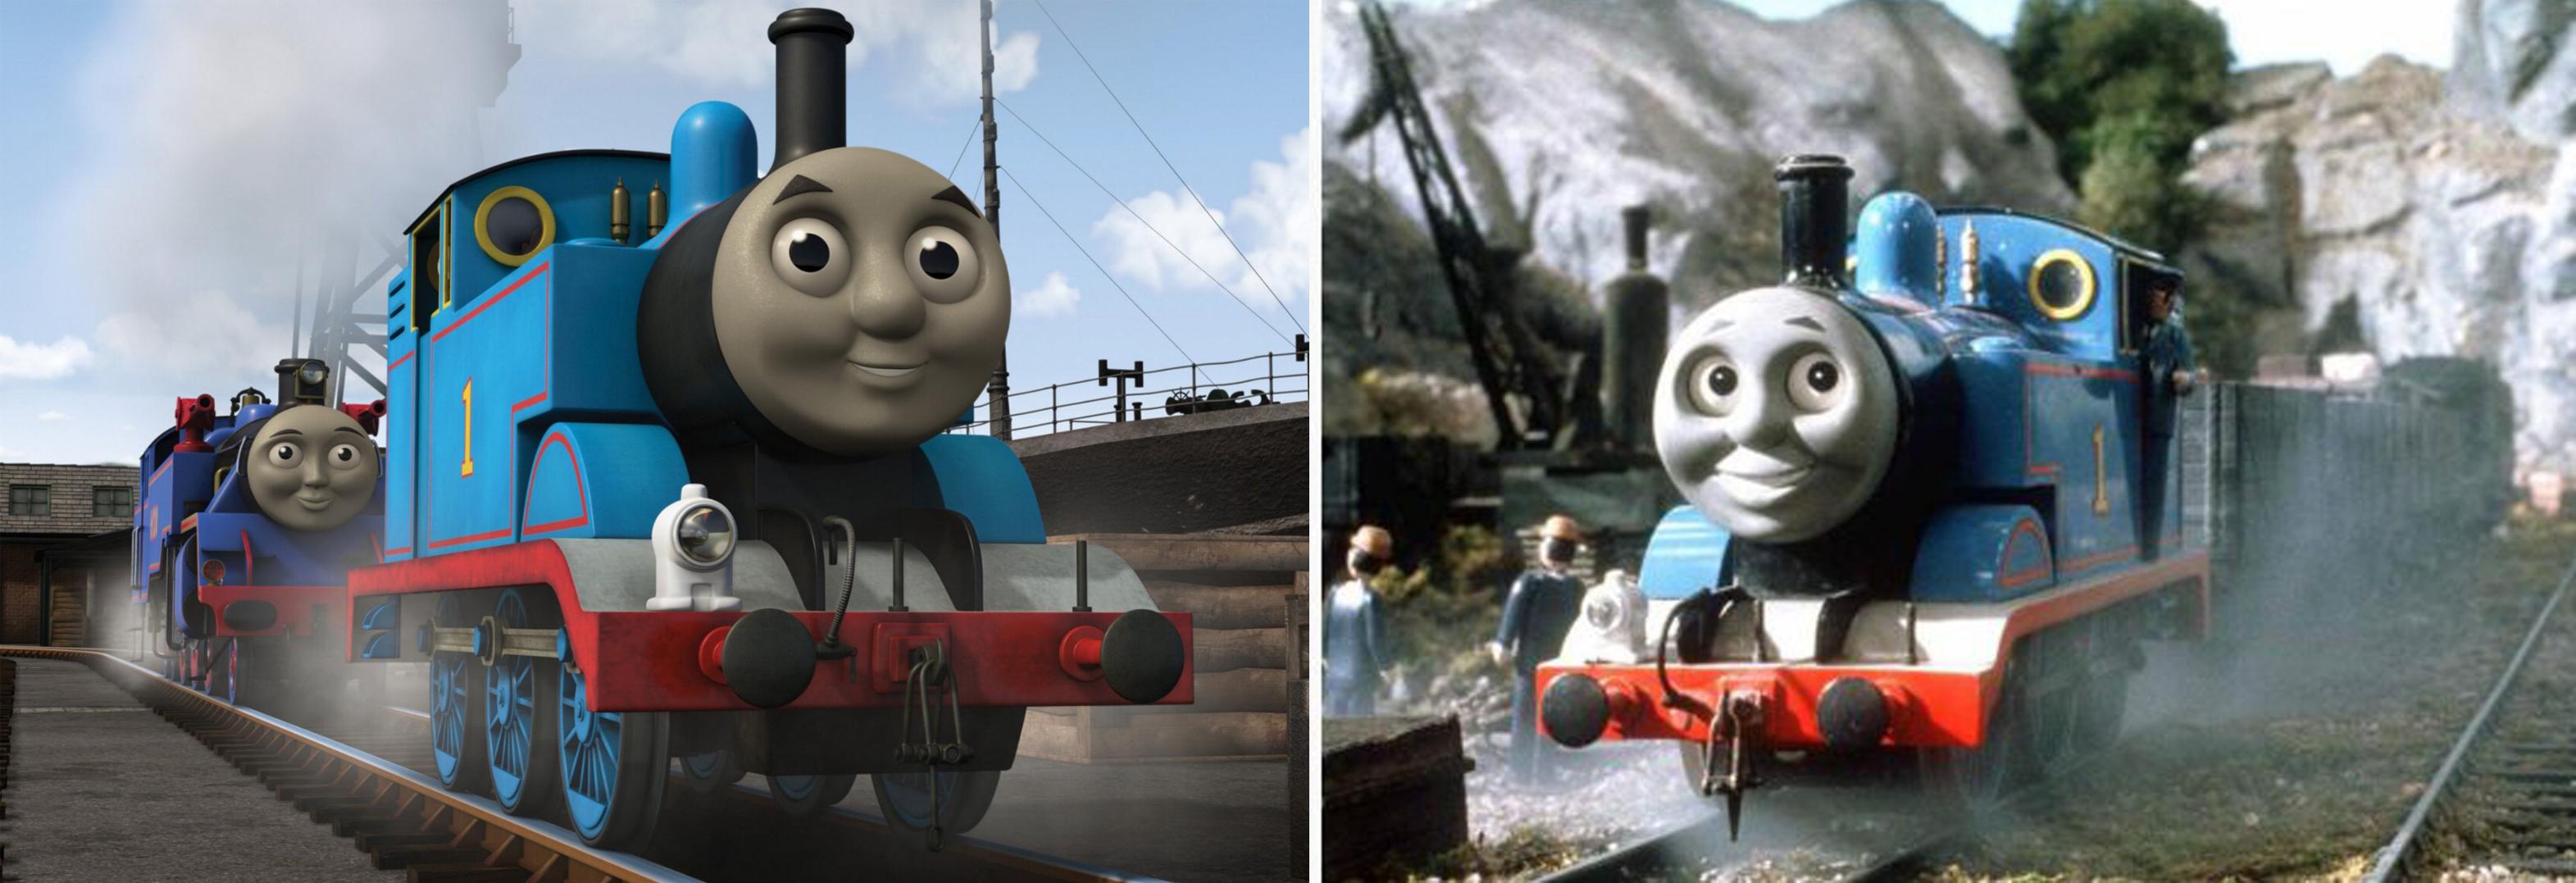 Thomas-the-Tank-Engine-LR25 copy